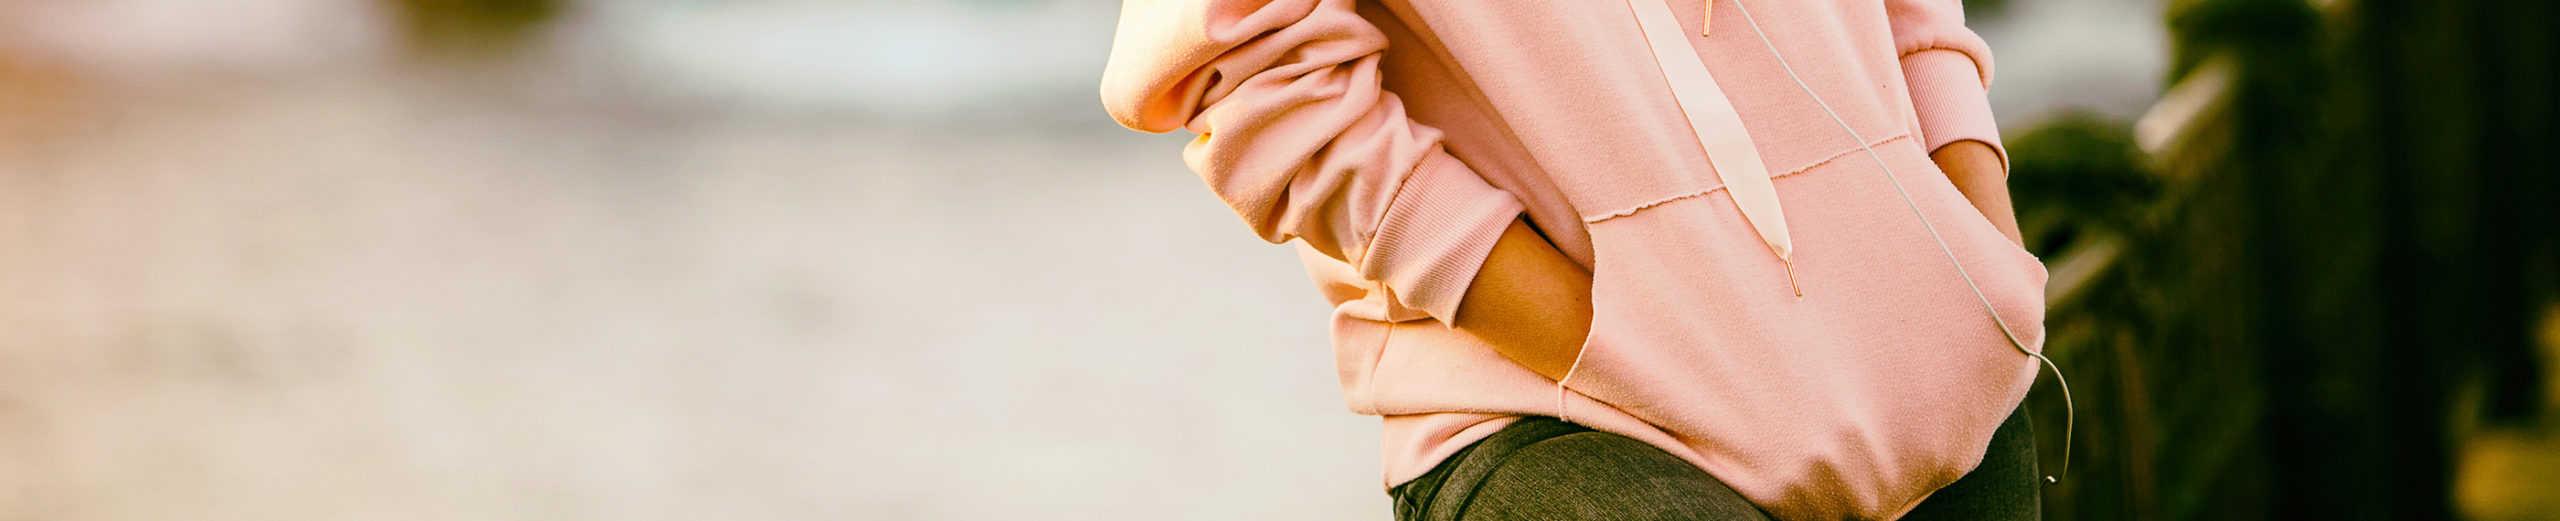 pullover-designen-stickmanufaktur